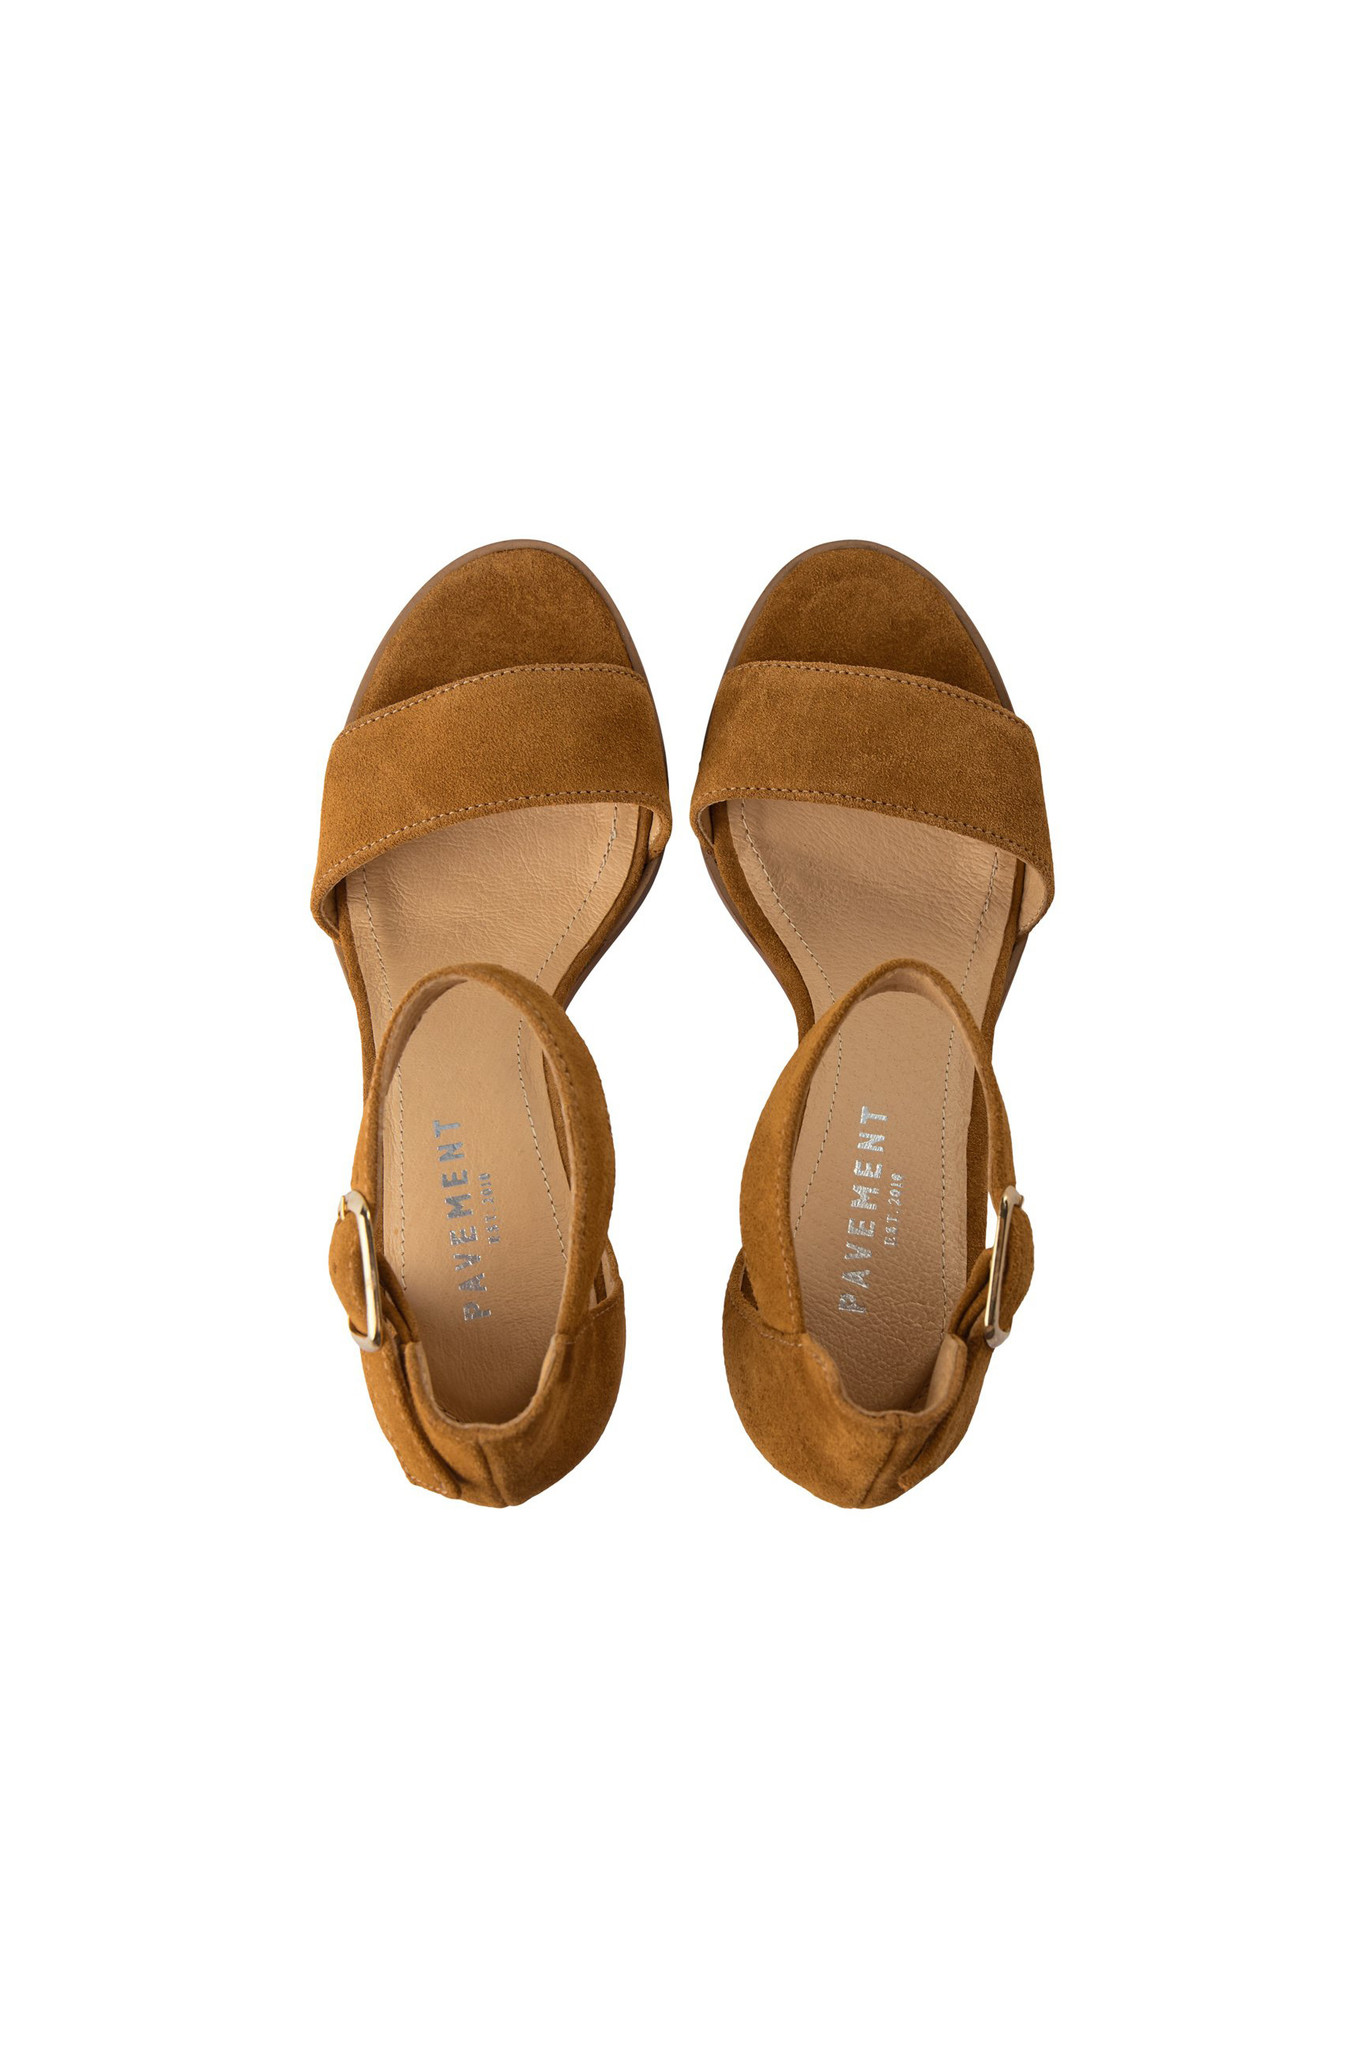 Silke Sandal - Tan Suede-3